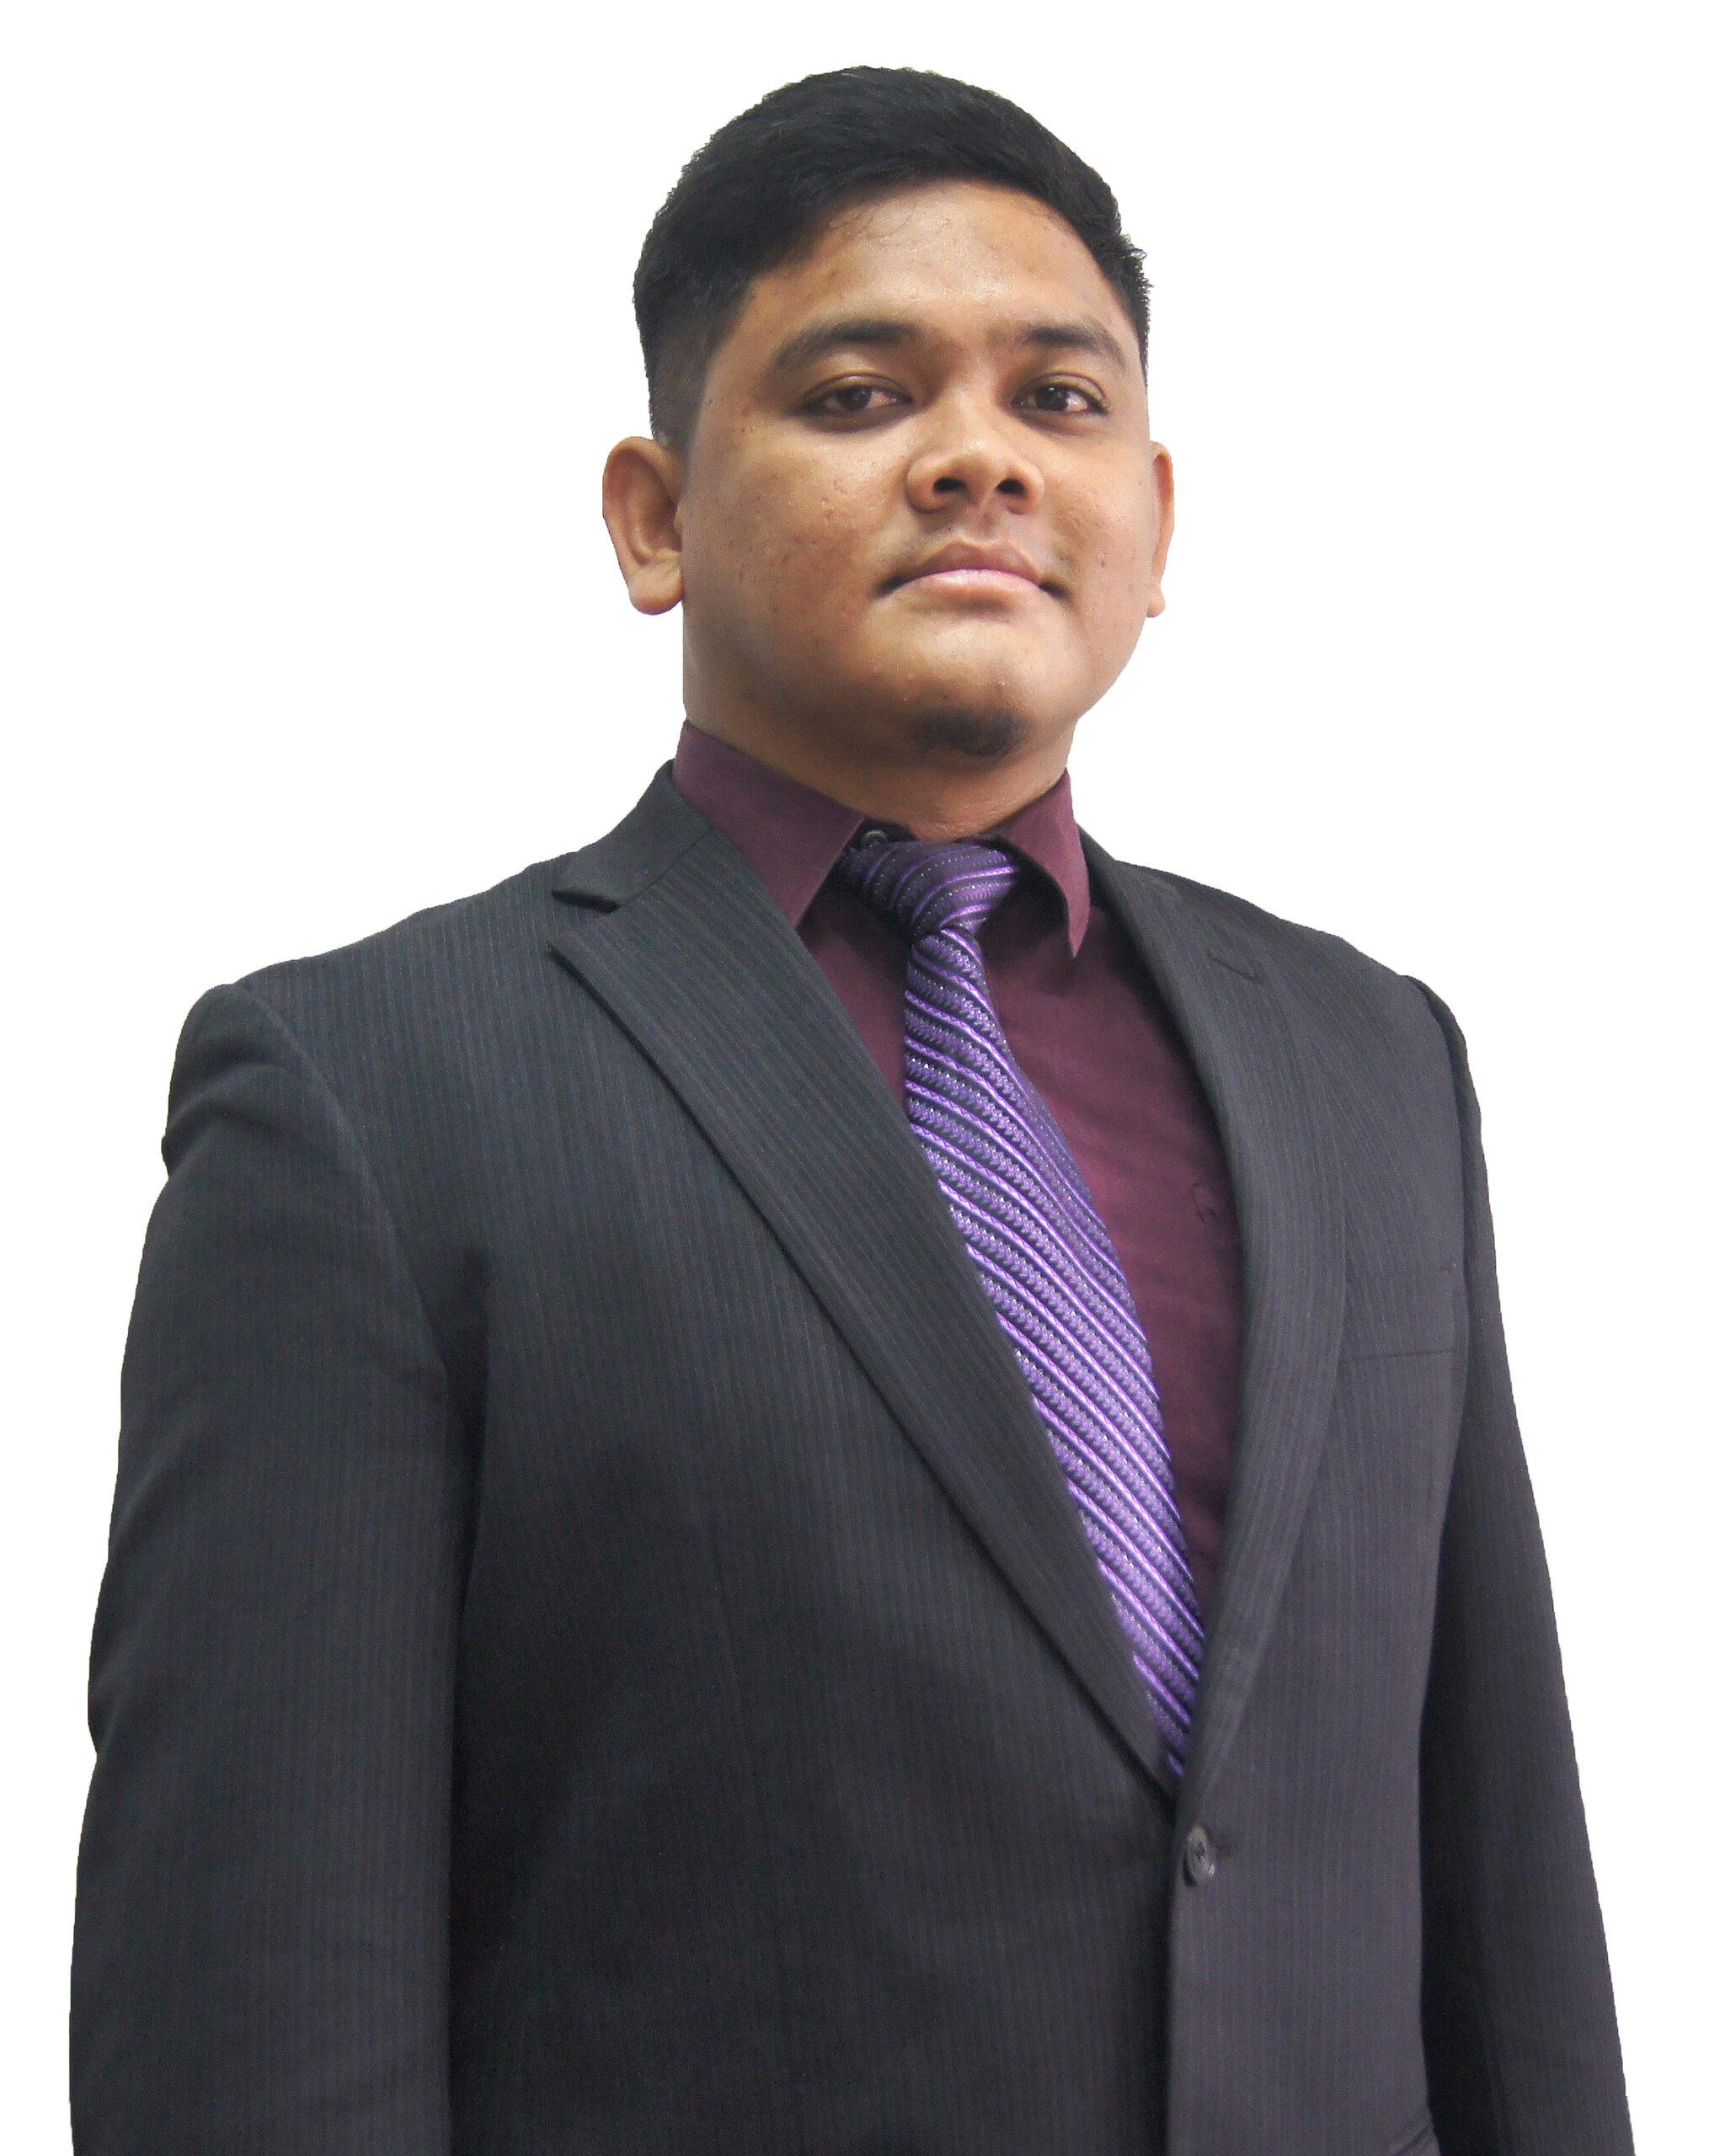 Muhamad Ridzuan Bin Mohd Raki